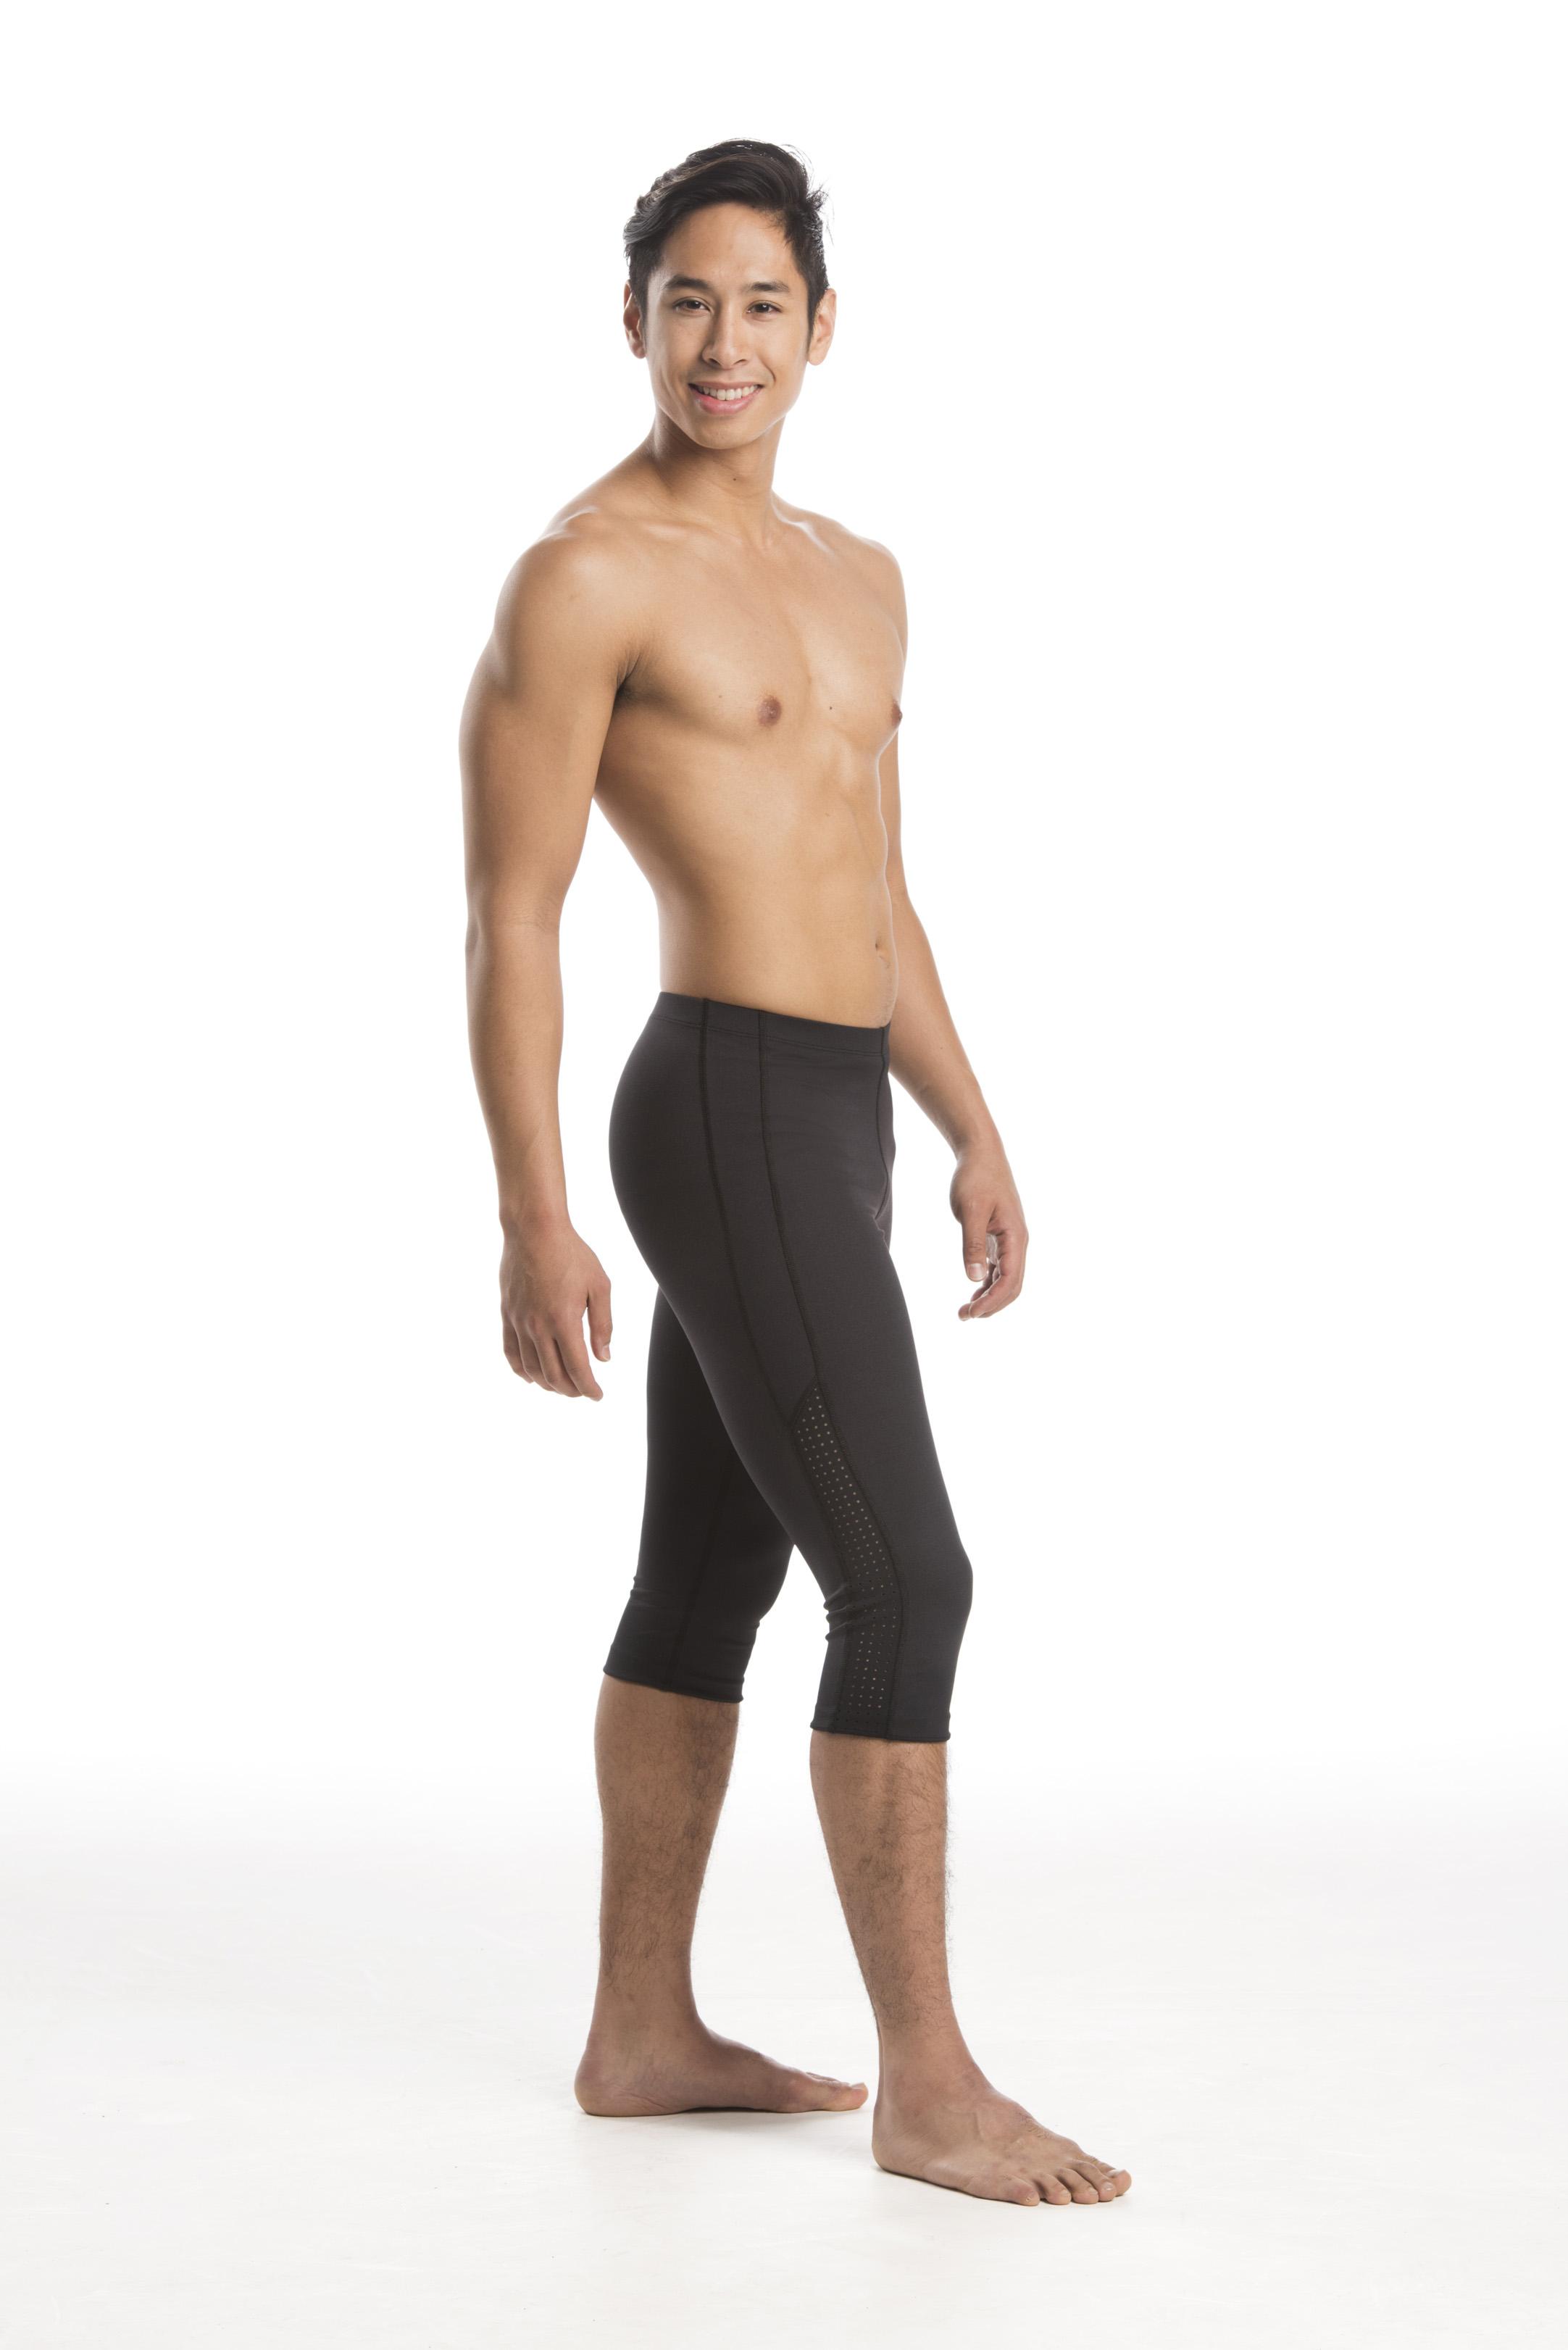 cd1141171d907 AinslieWear Men's Leggings - Below Knee - Dance Desire Dance Store